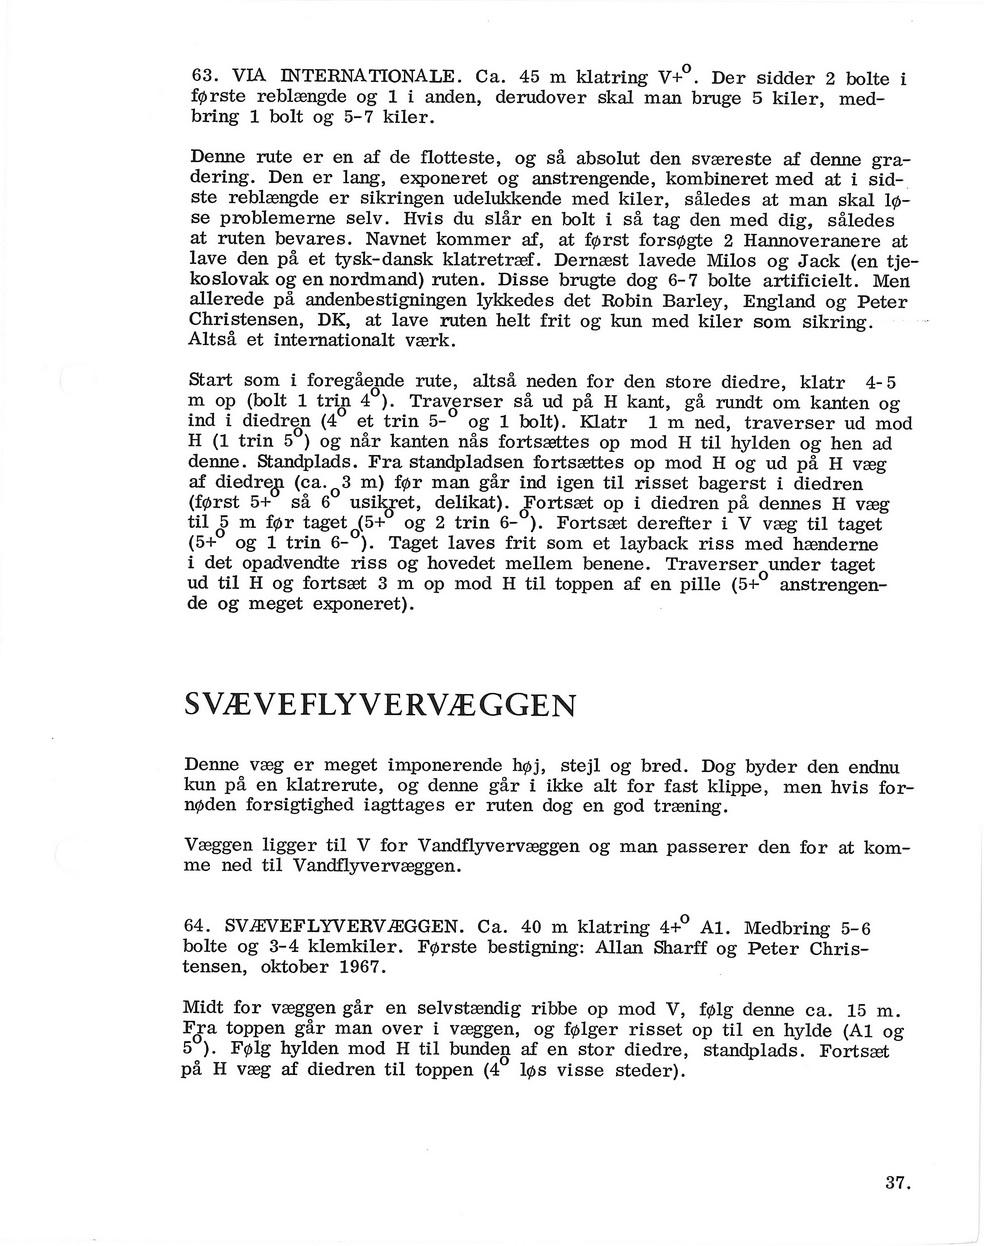 Kullen guide 1972 037.jpg